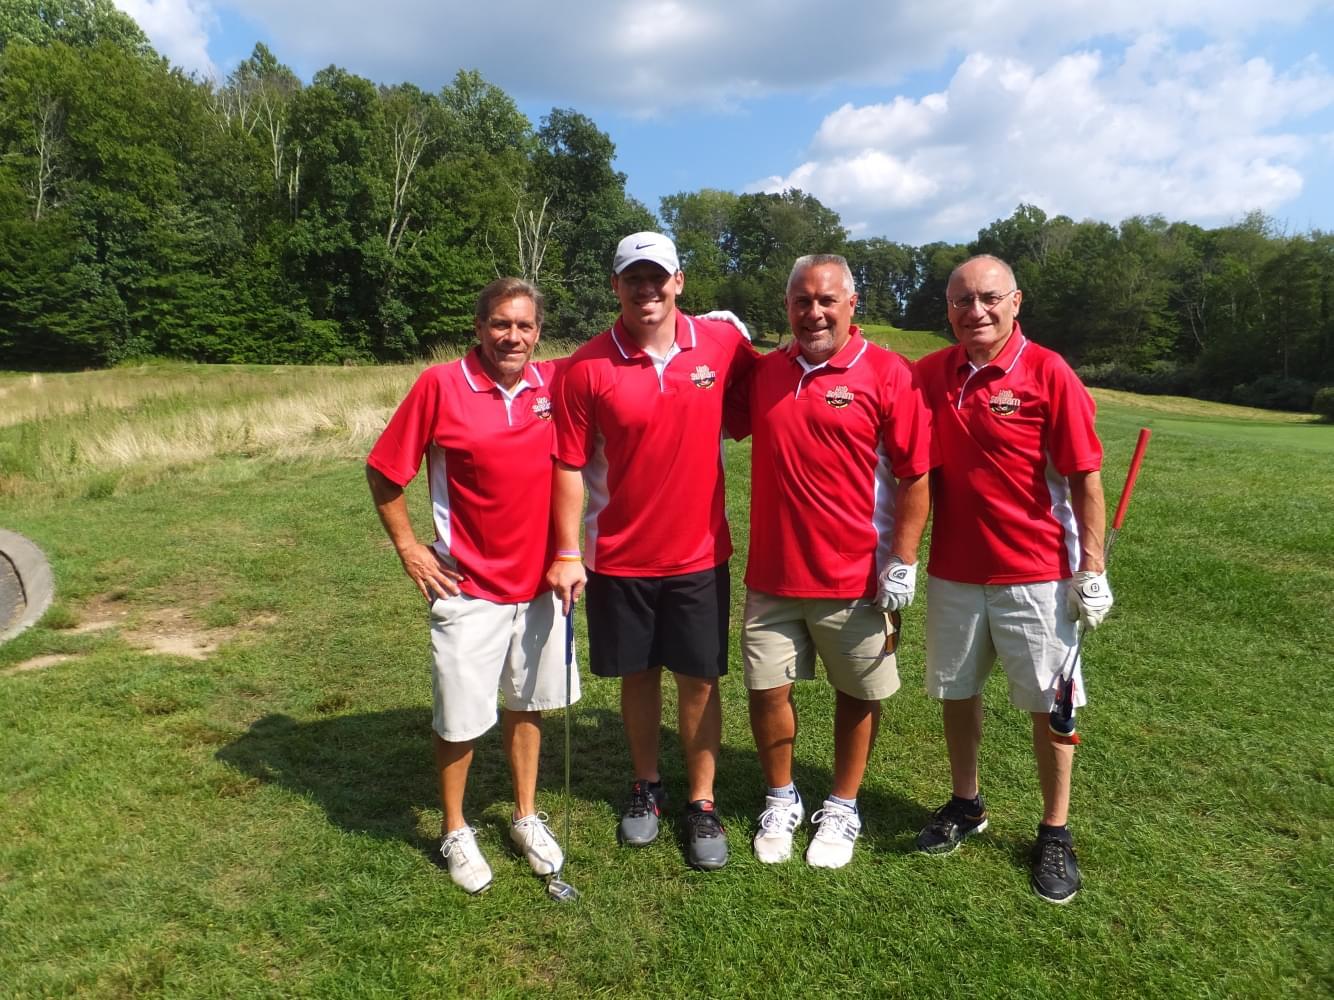 PLR Mike Lapitino McDermott Chevrolet & Lexus Golf Classic – Foursomes